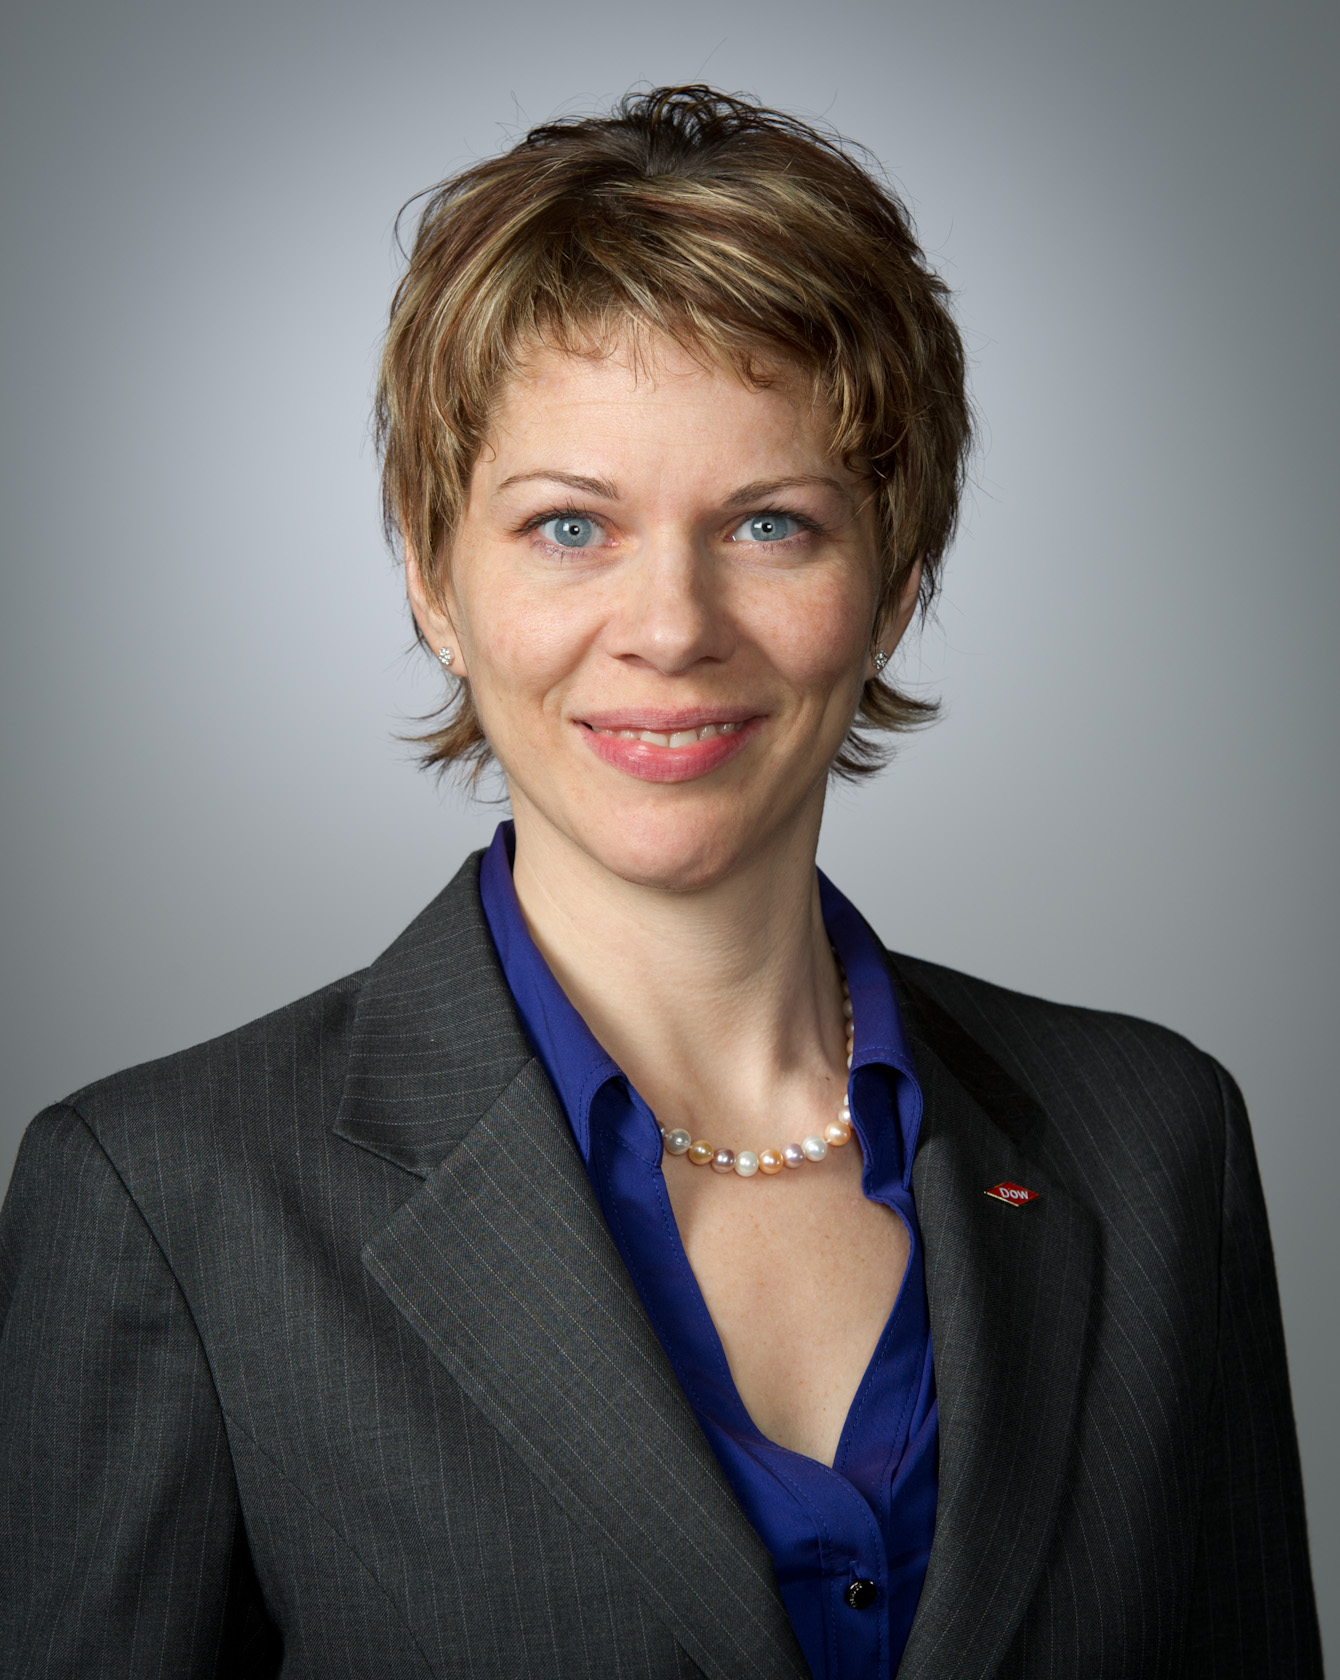 Laura Wolak